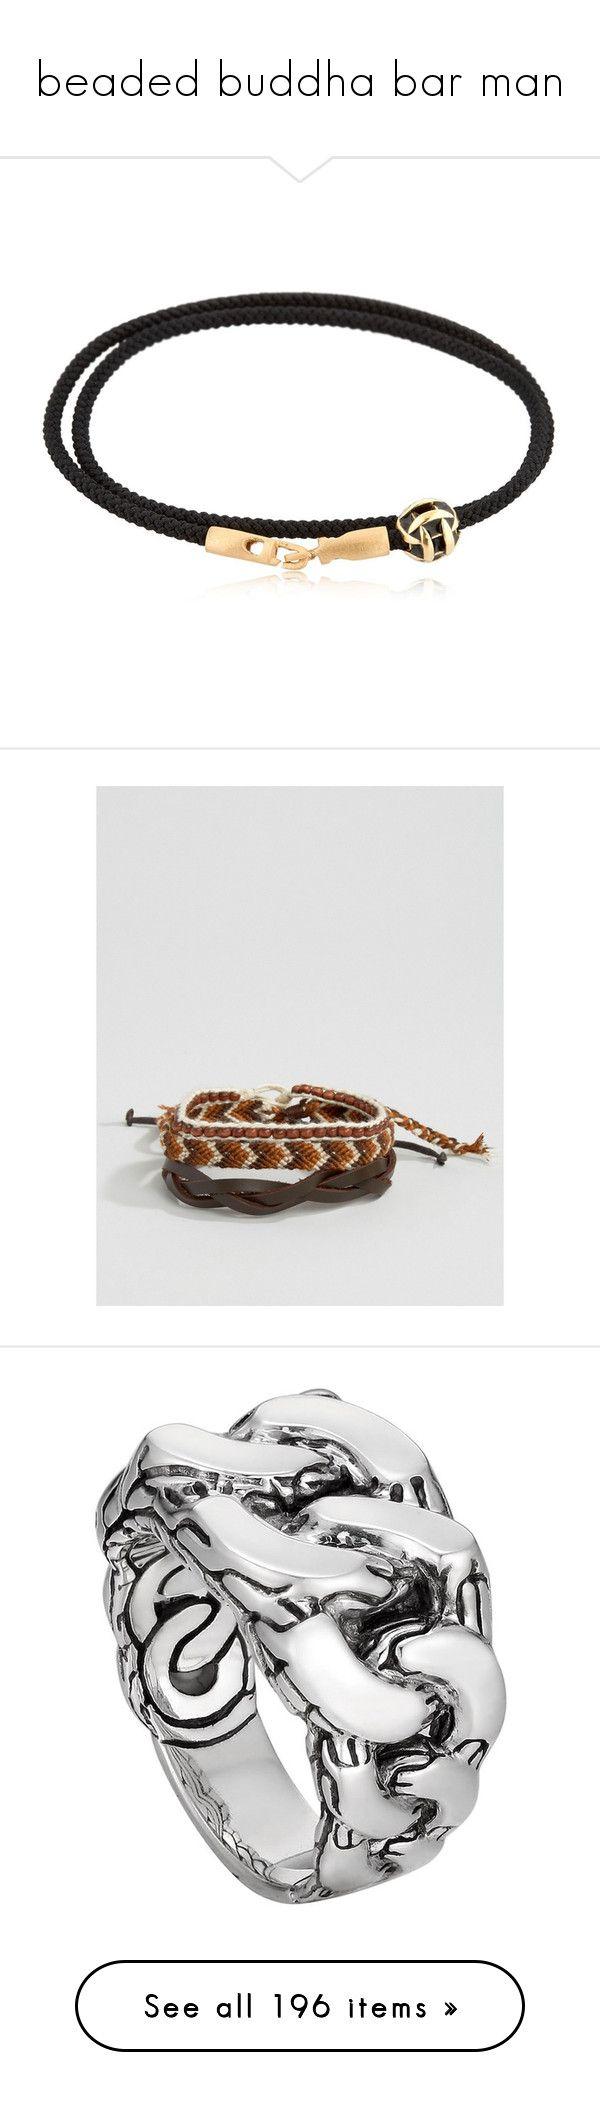 """beaded buddha bar man"" by baileycalifornia ❤ liked on Polyvore featuring men's fashion, men's jewelry, men's bracelets, black, mens cord bracelets, mens bracelets, mens watches jewelry, multi, mens bead bracelets and mens leather braided bracelets"